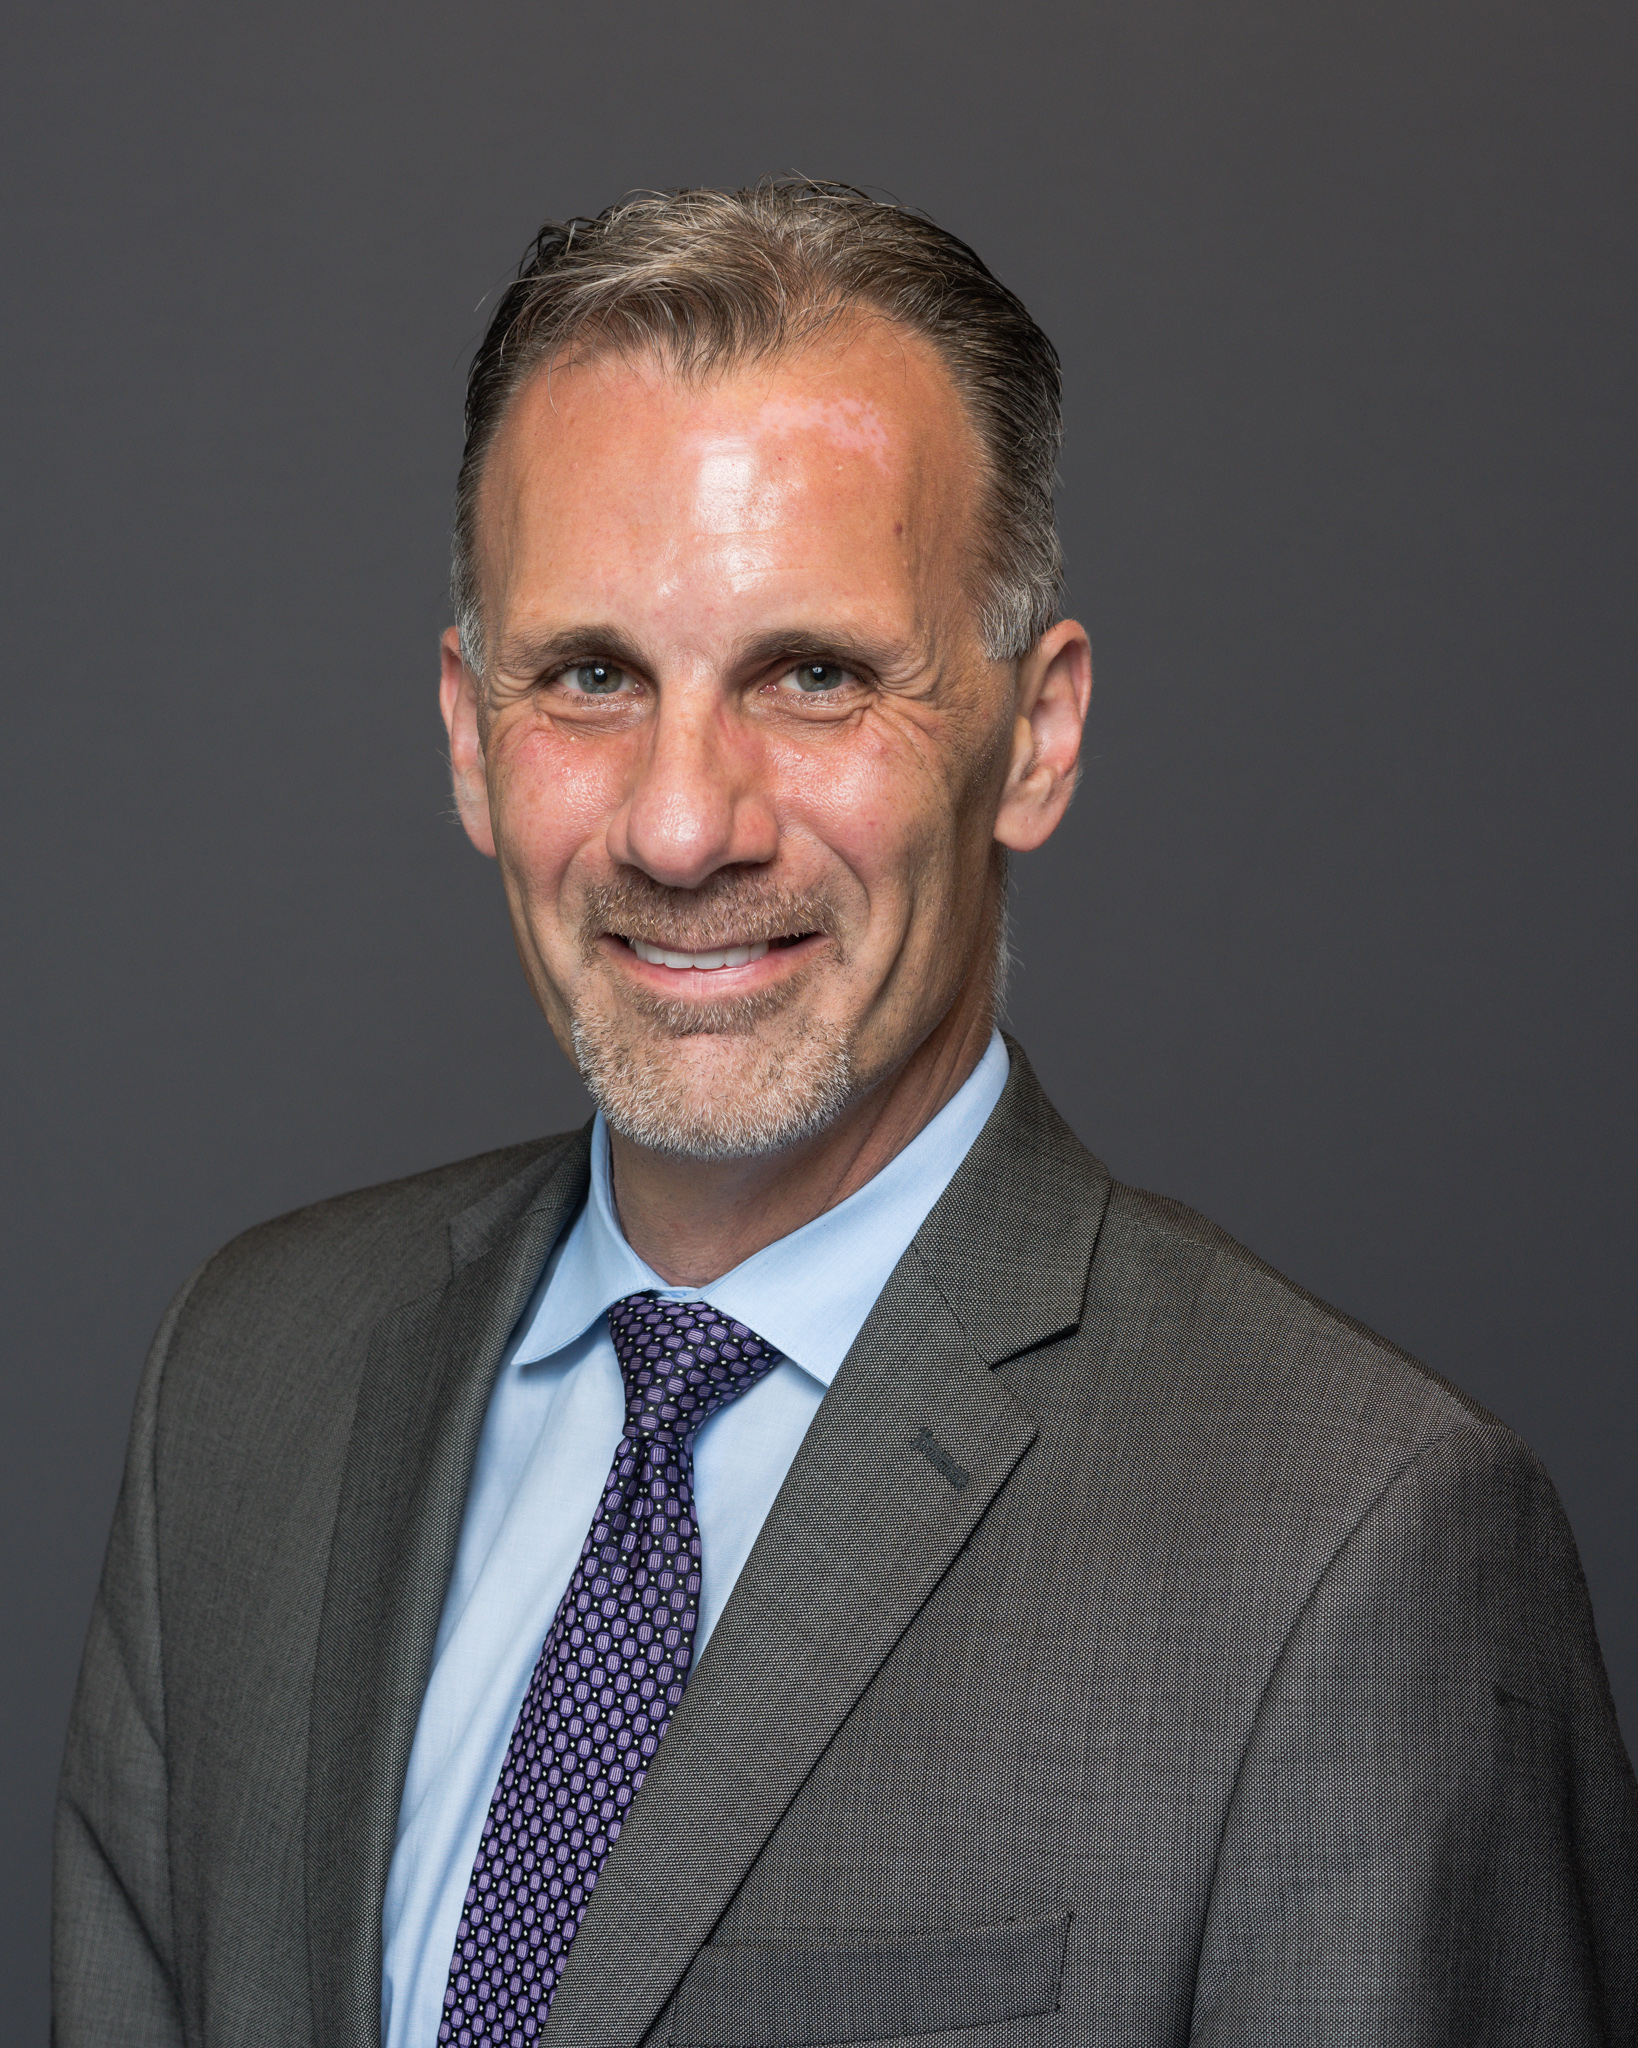 Paul Stenbjorn   Vice President, Information Technology